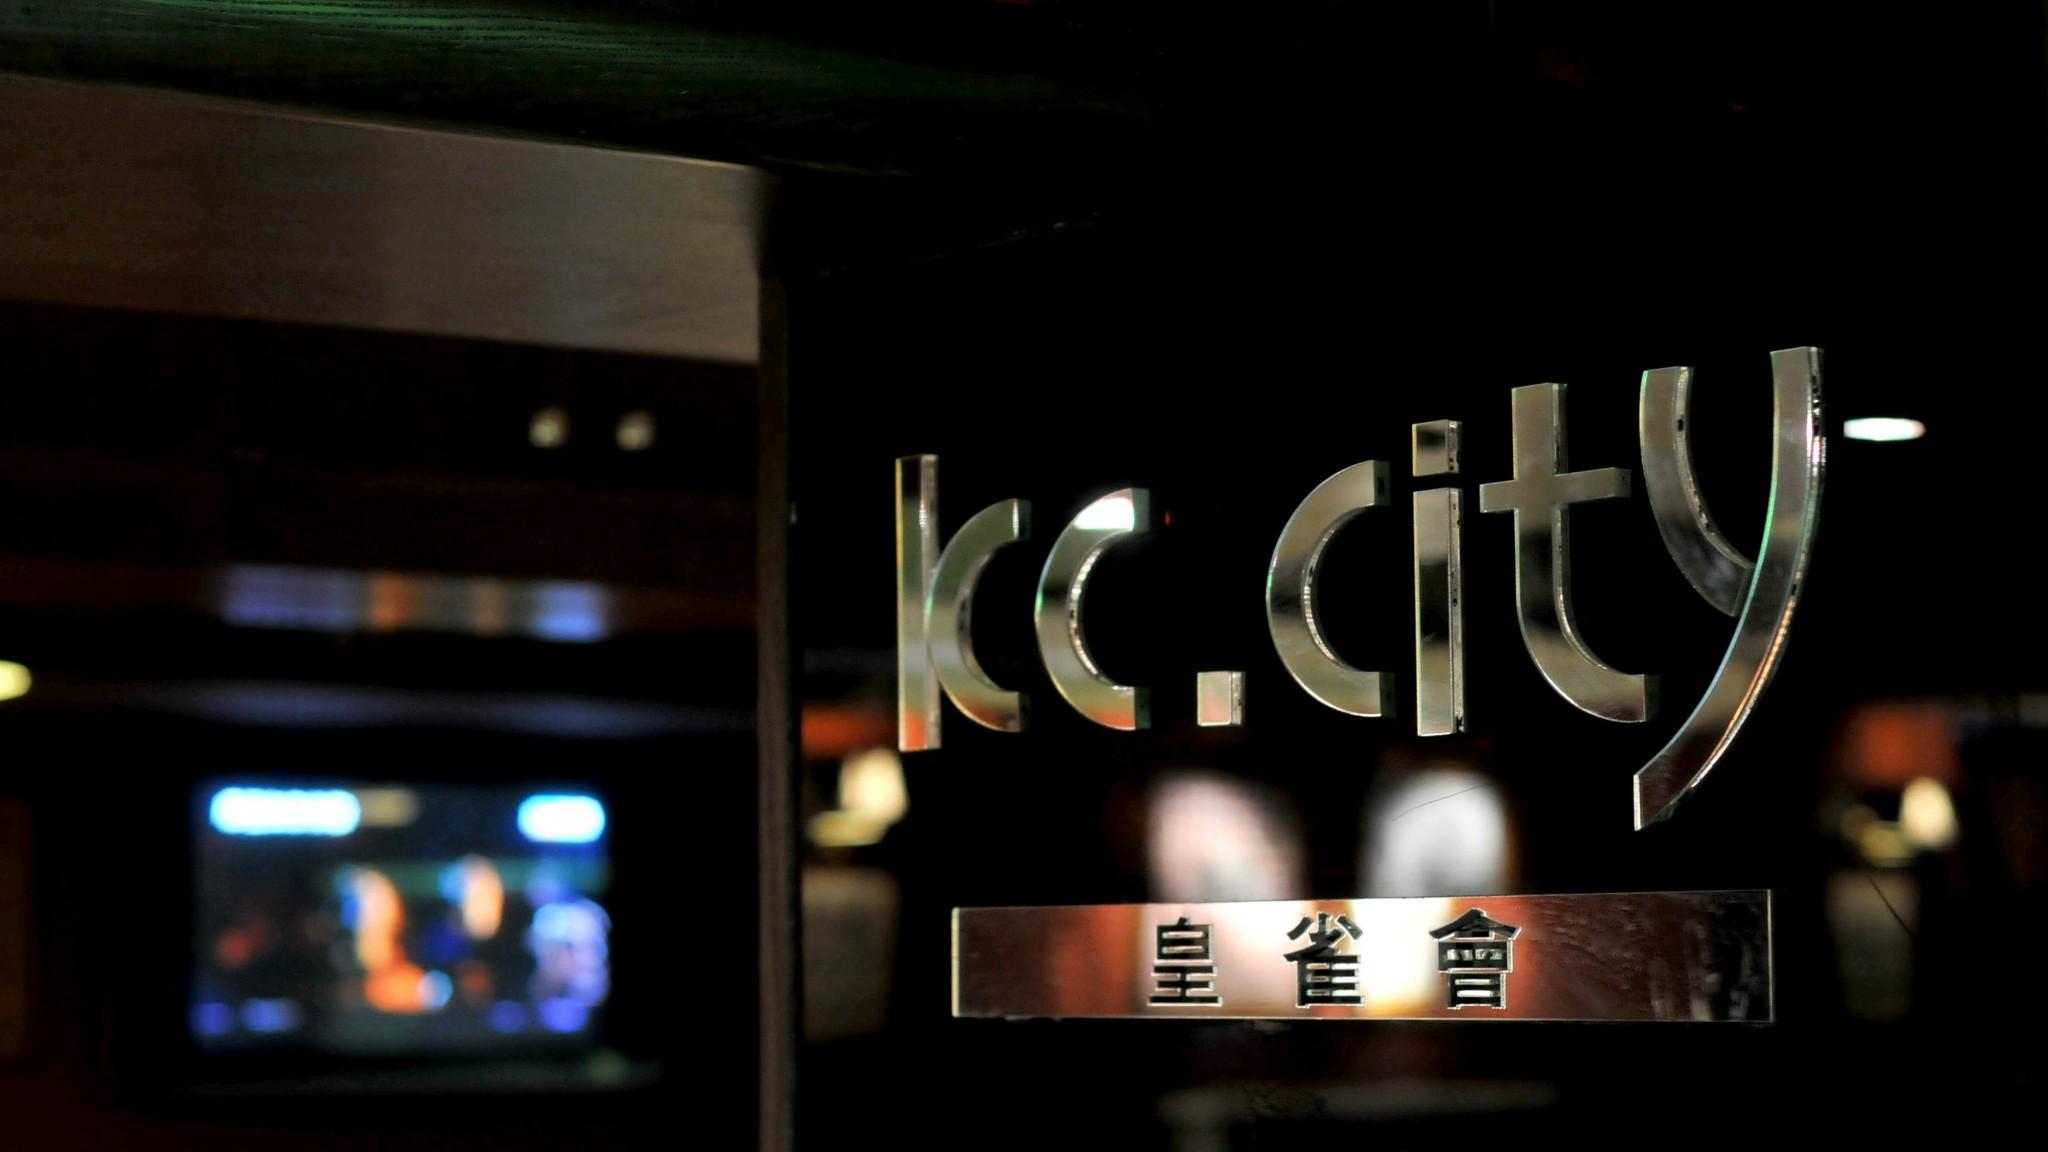 KC.City 皇雀會 麻雀 桌球